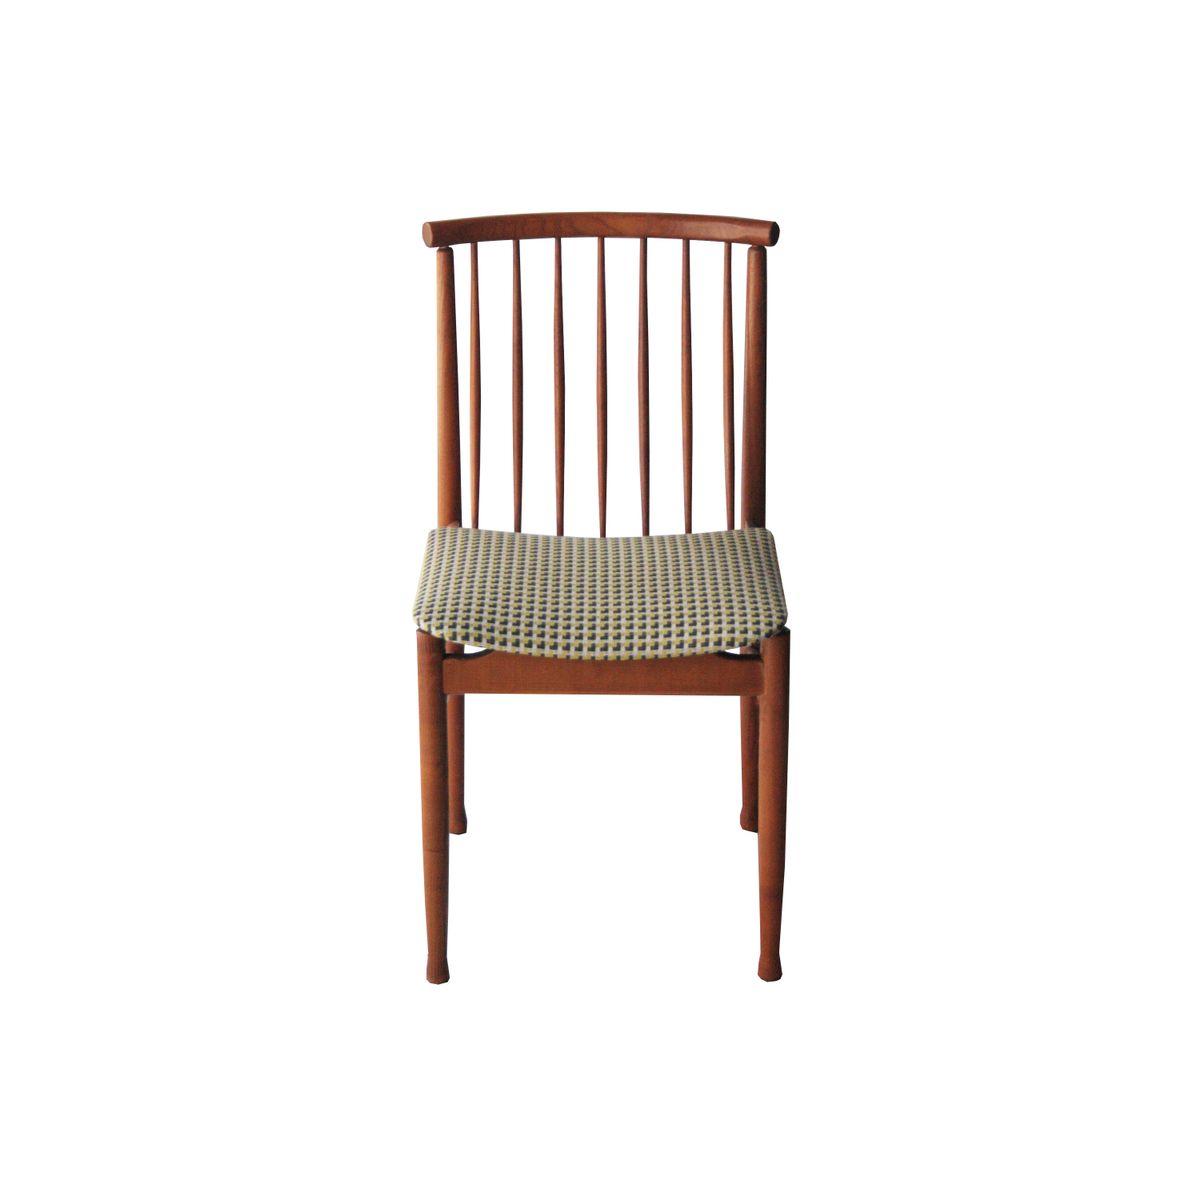 schwedische st hle 1960er 4er set bei pamono kaufen. Black Bedroom Furniture Sets. Home Design Ideas